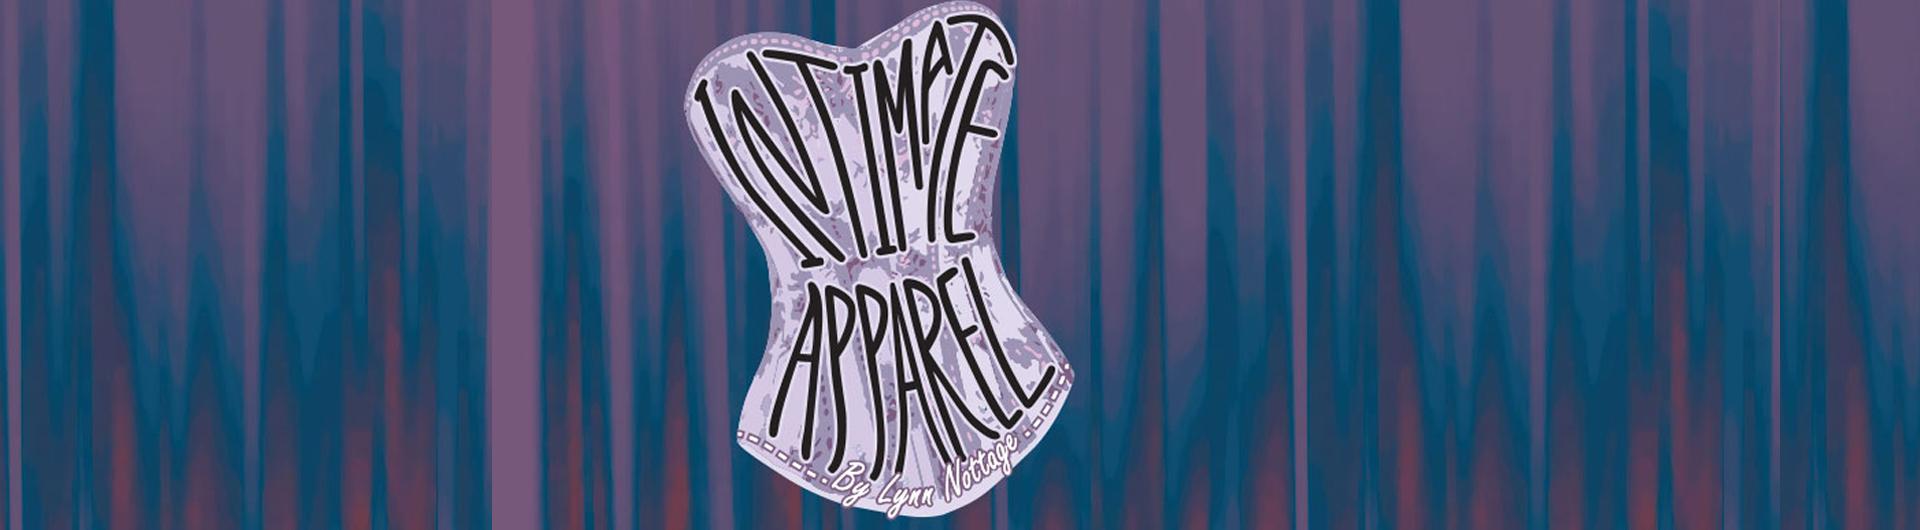 Intimate Apparel title inside lavender corset